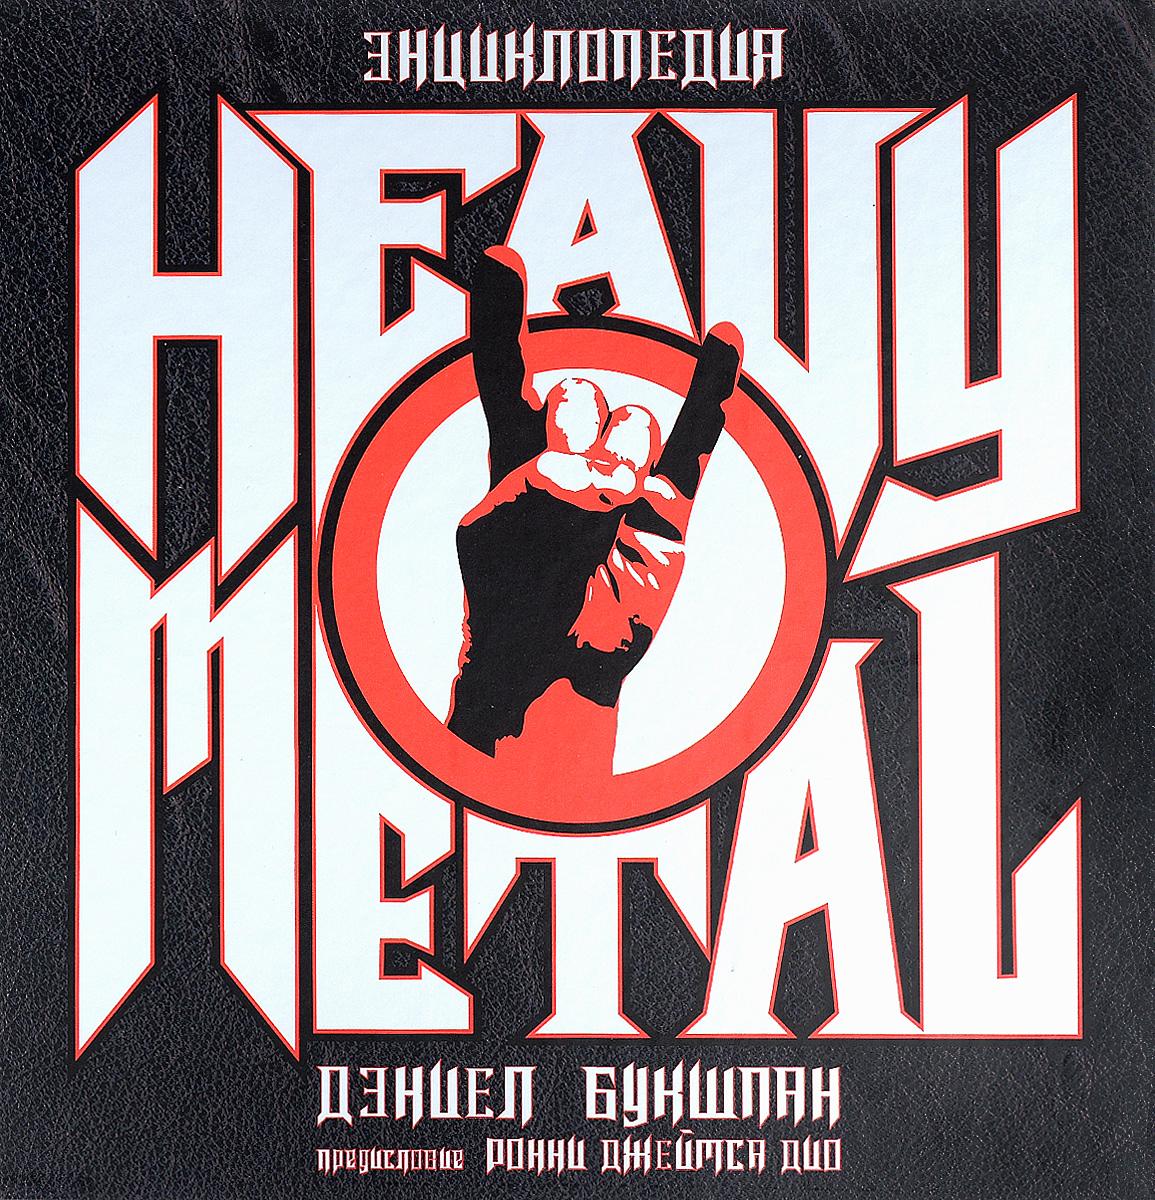 Дэниел Букшпан Энциклопедия Heavy Metal